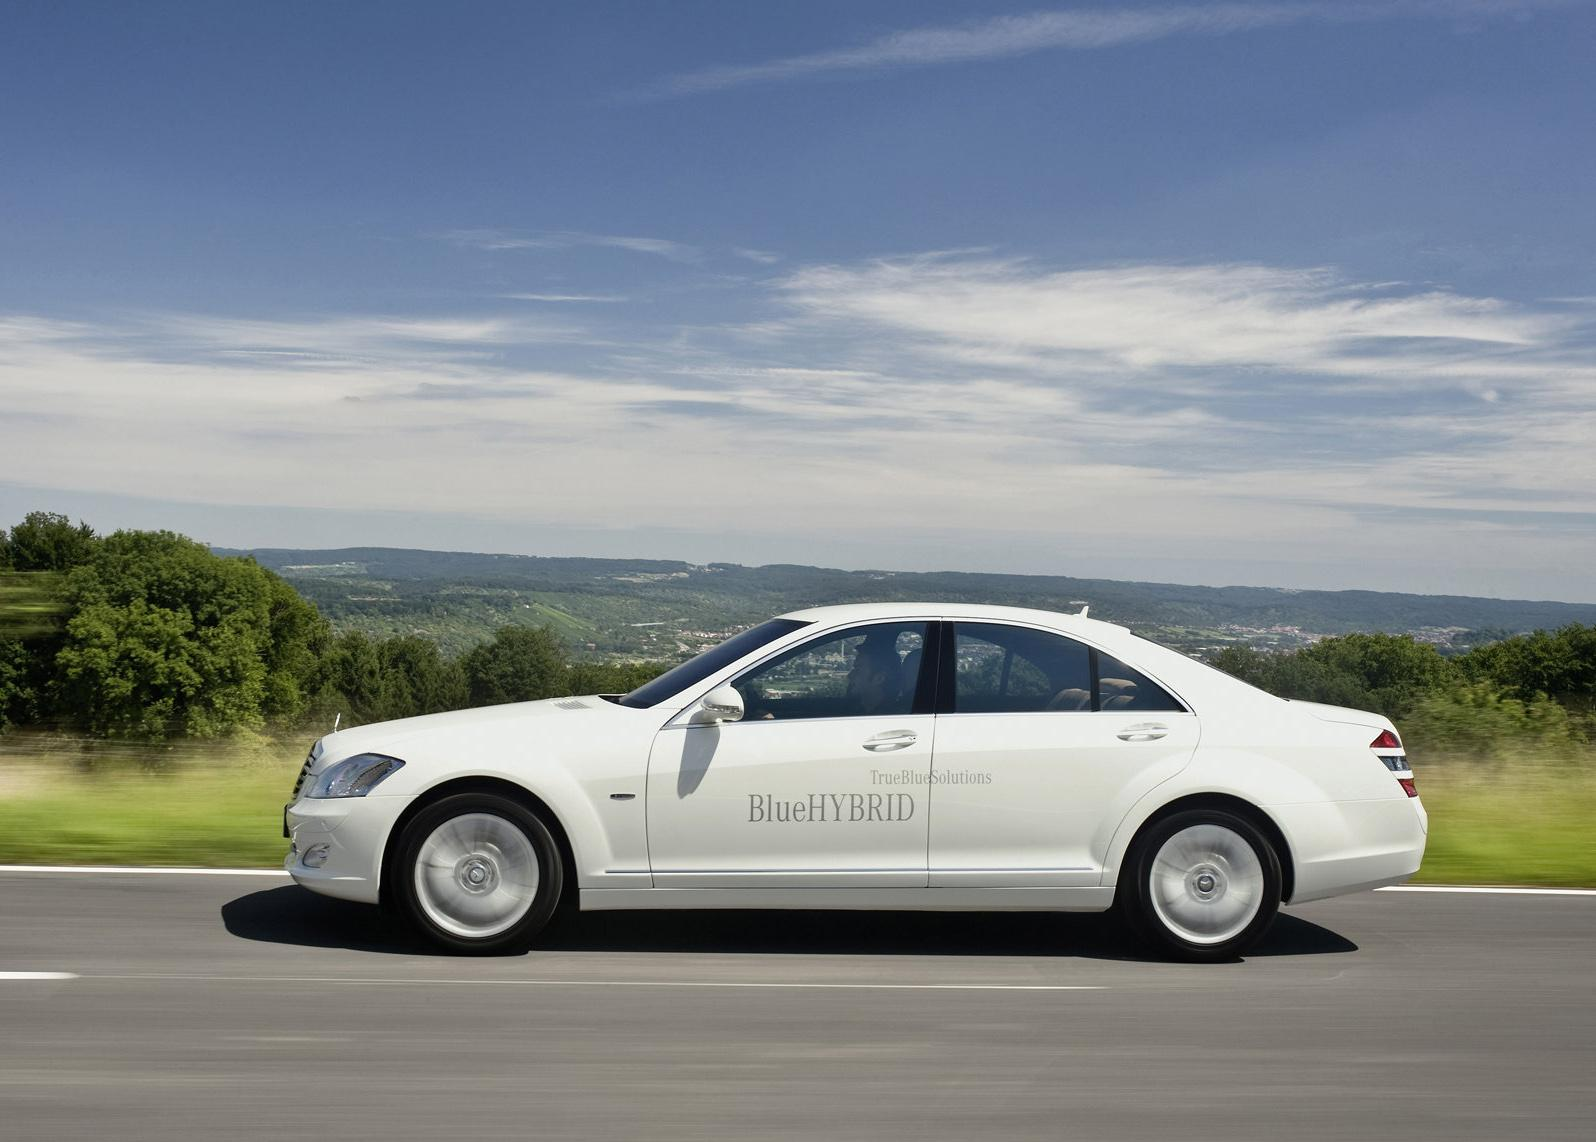 2010 mercedes benz s400 bluehybrid for Mercedes benz s400 price